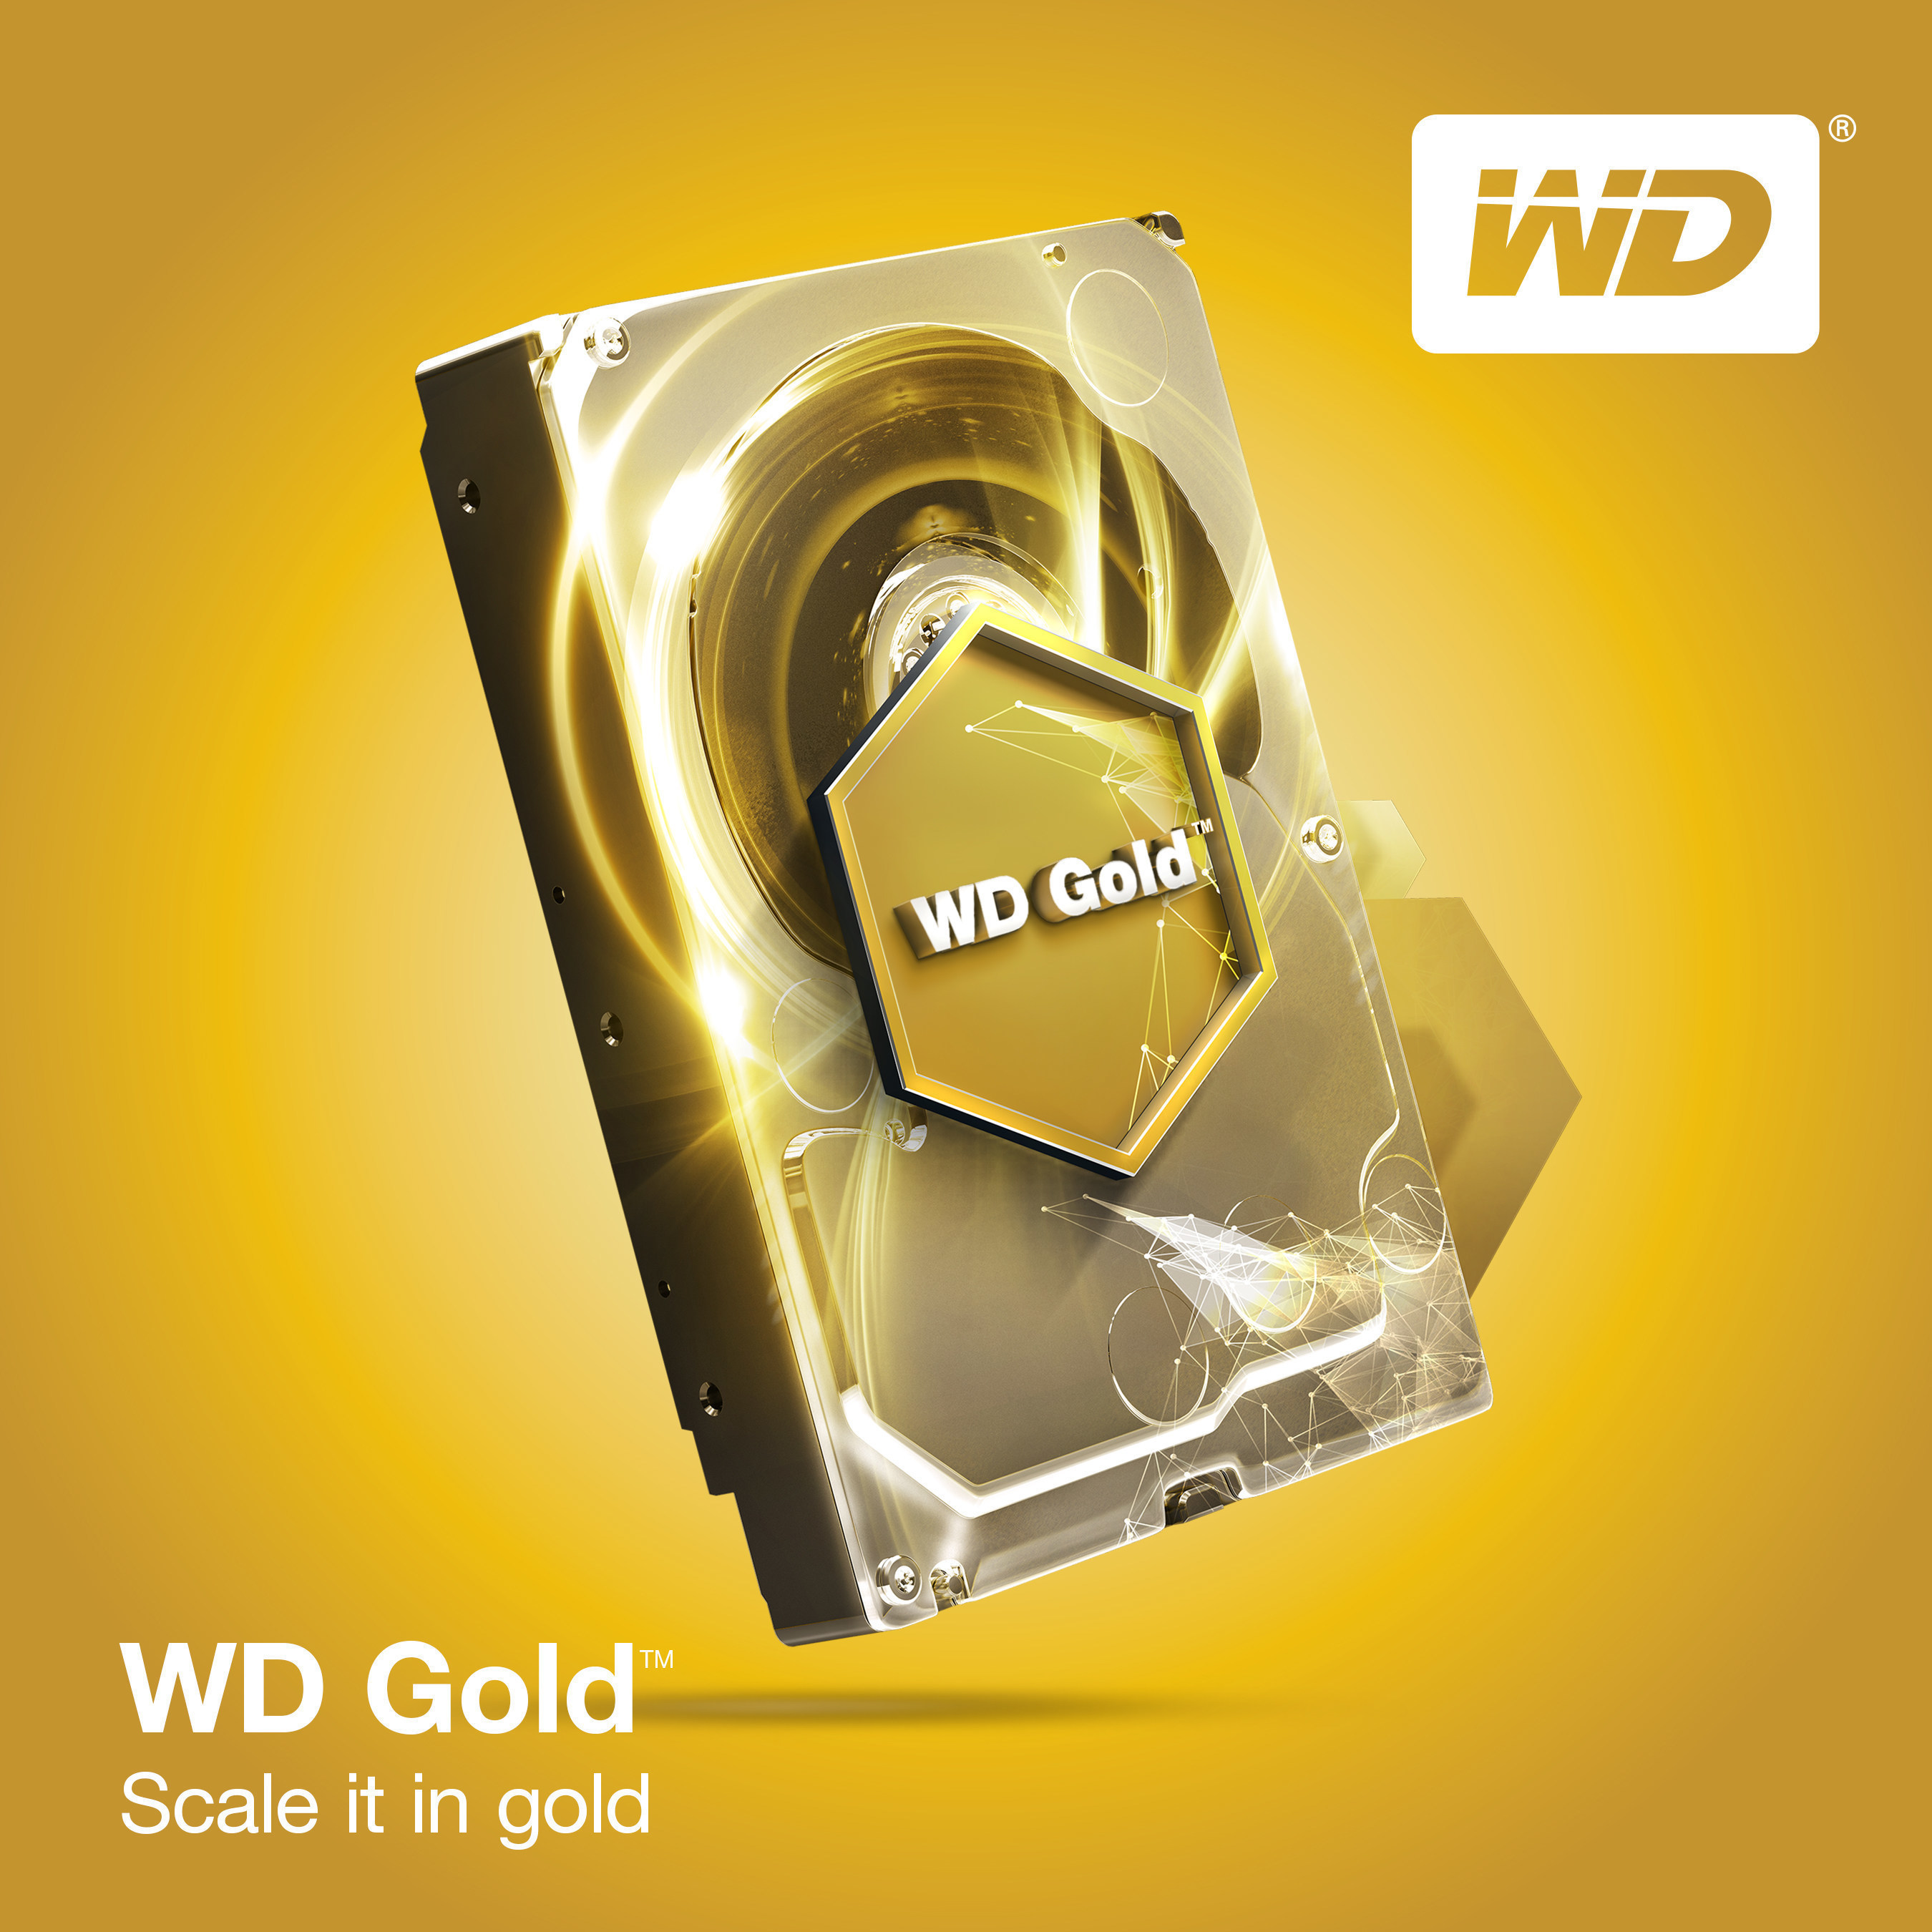 Western Digital Enhances Its Datacenter Portfolio With WD Gold Hard Drives